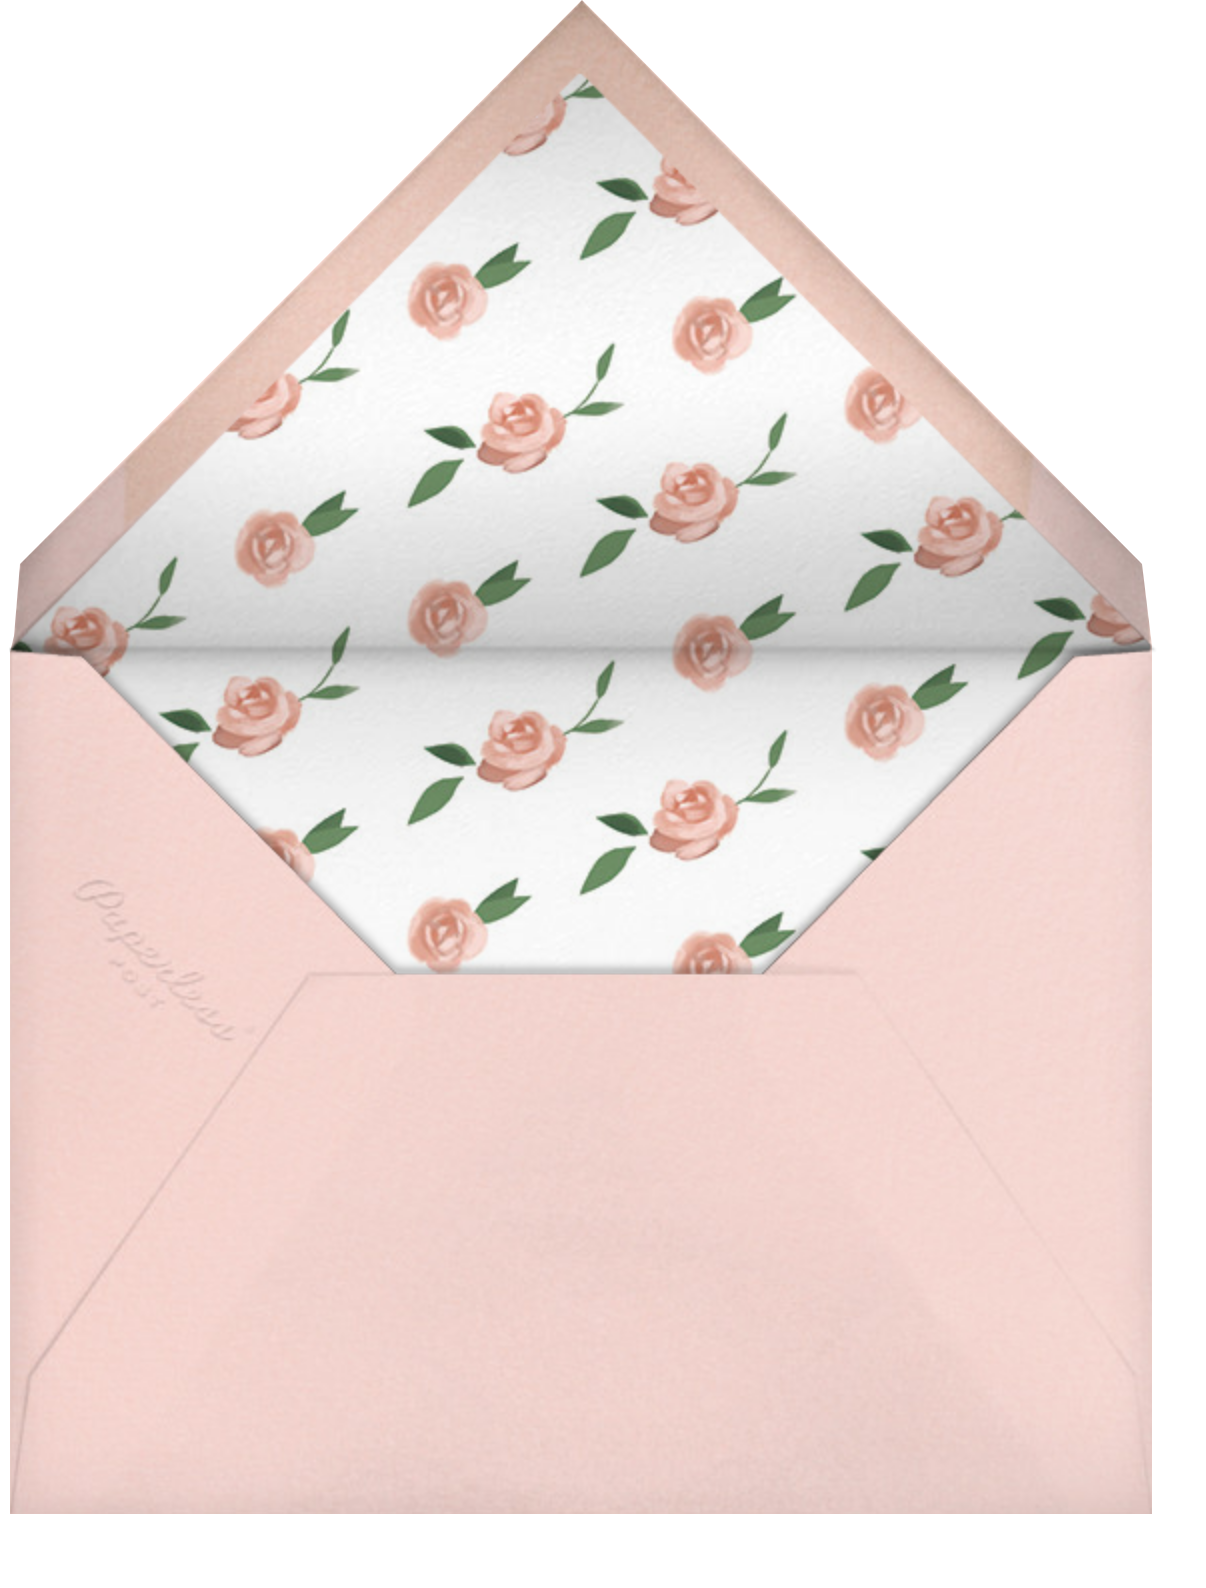 Teablossom (Photo Invitation) - Rose Gold/Pink - Paperless Post - All - envelope back